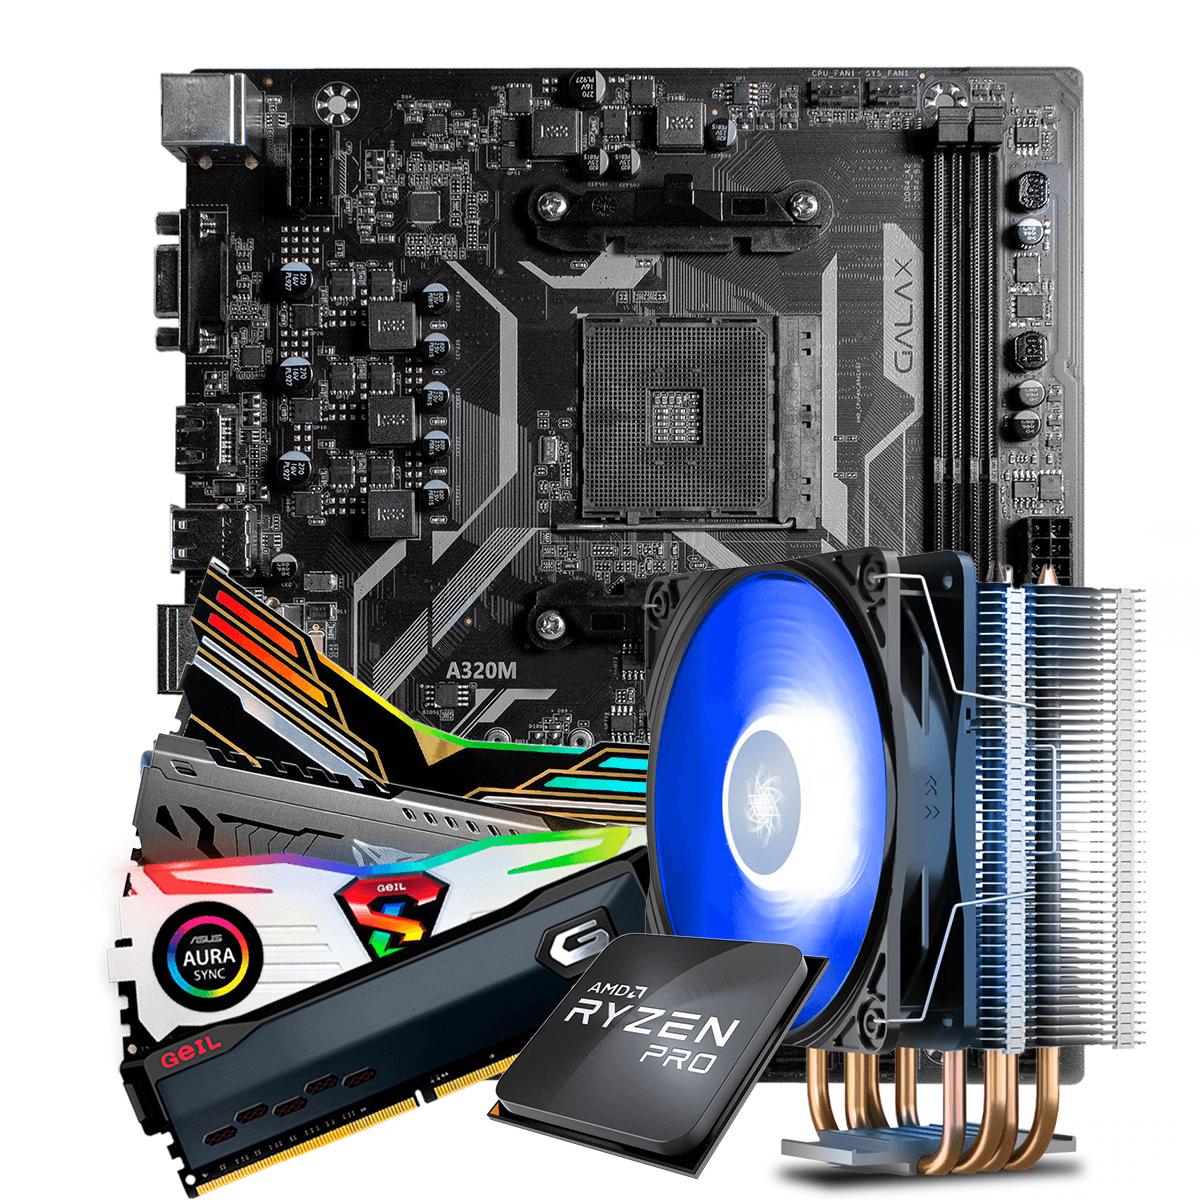 Kit Upgrade, AMD Ryzen 3 PRO 3200GE 3.8GHz Turbo + Cooler, + Galax A320M + Memória DDR4 16GB (2x8GB) 3000MHz